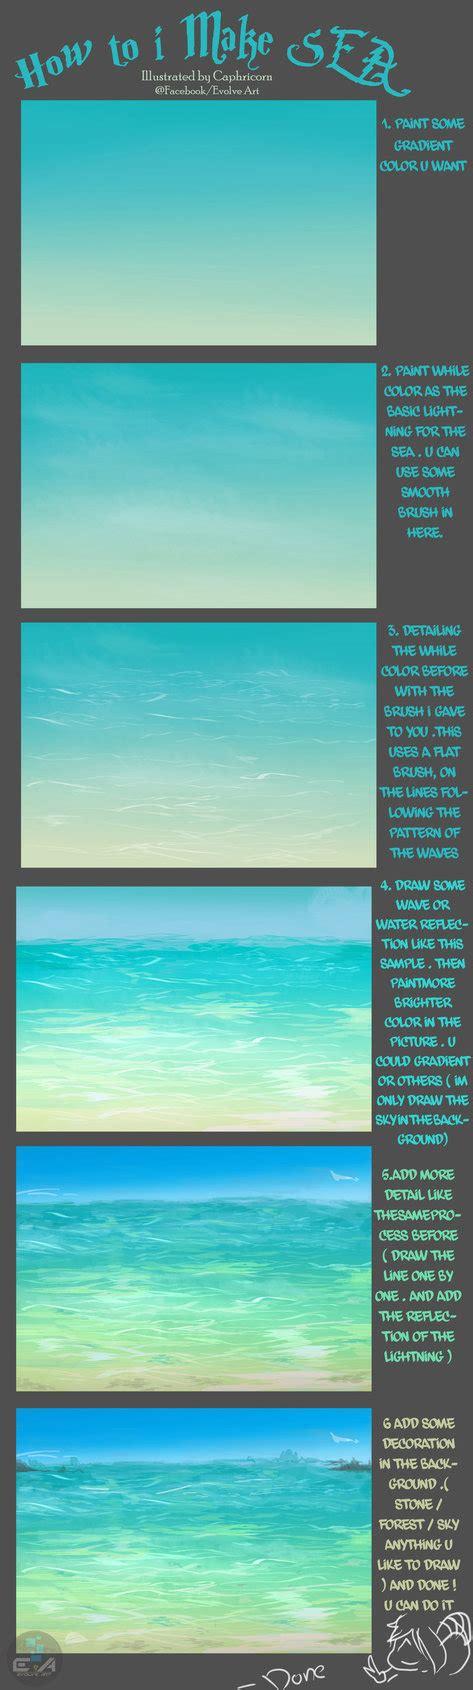 waou tutorial 1 how to make a beach rock rug how to i make sea by caphricorn on deviantart